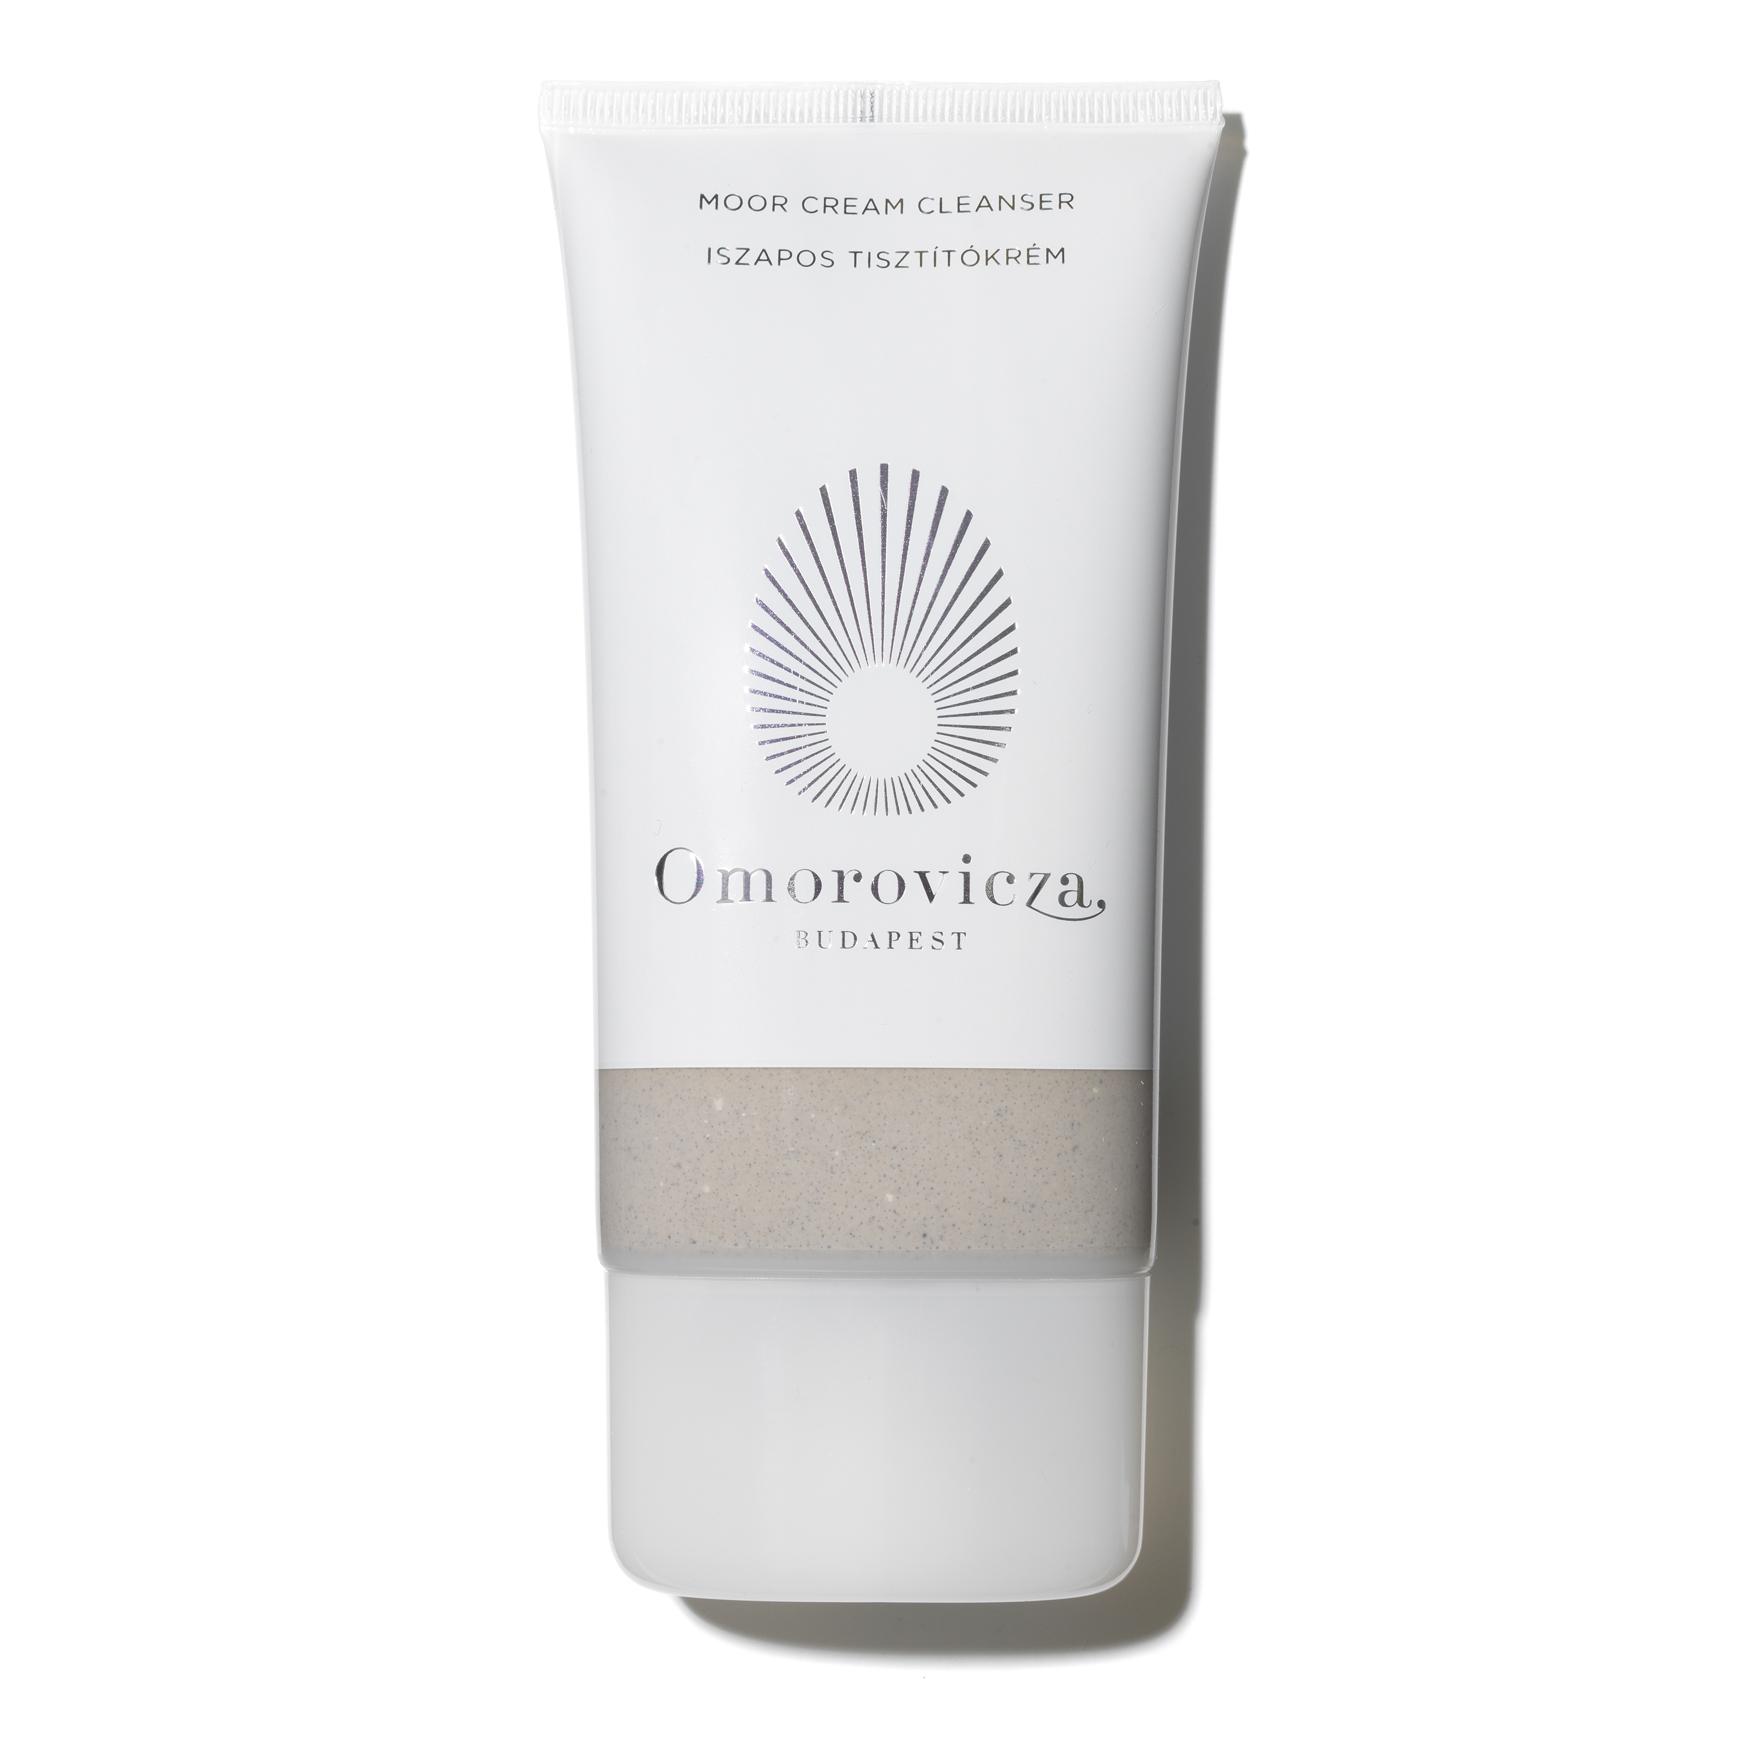 Omorovicza Moor Cream Cleanser   Space NK